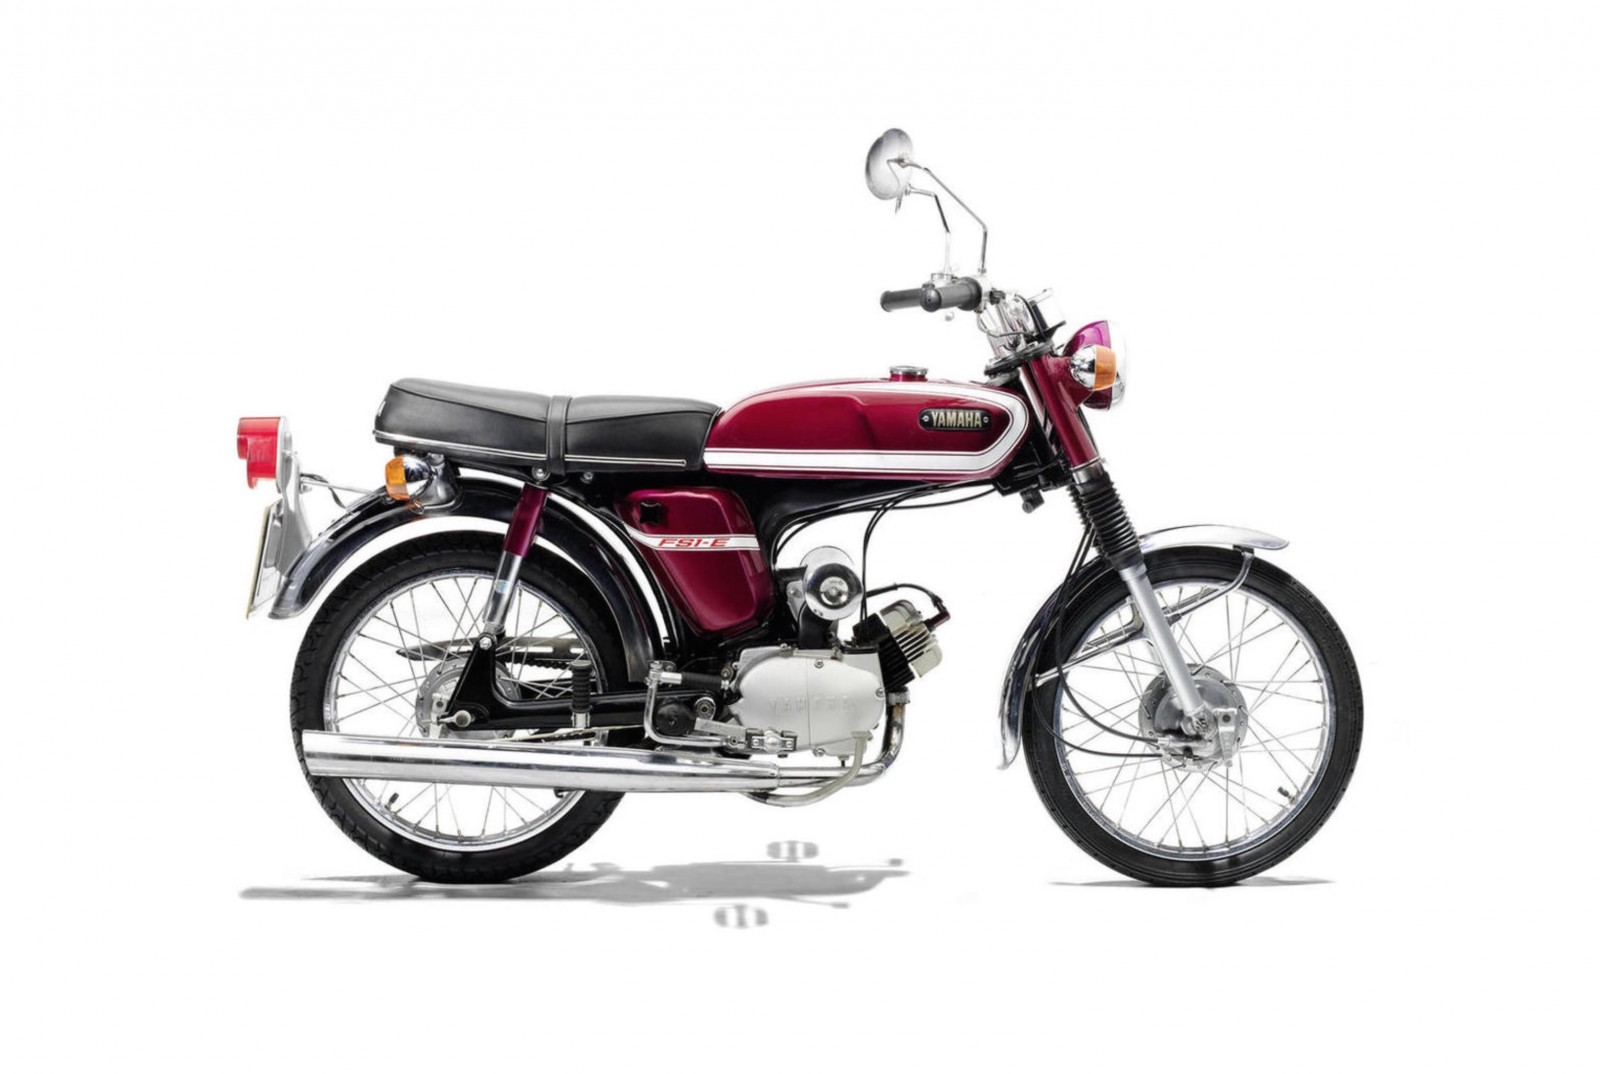 Yamaha FS1 E Moped 1600x1074 - James May's Yamaha FS1-E